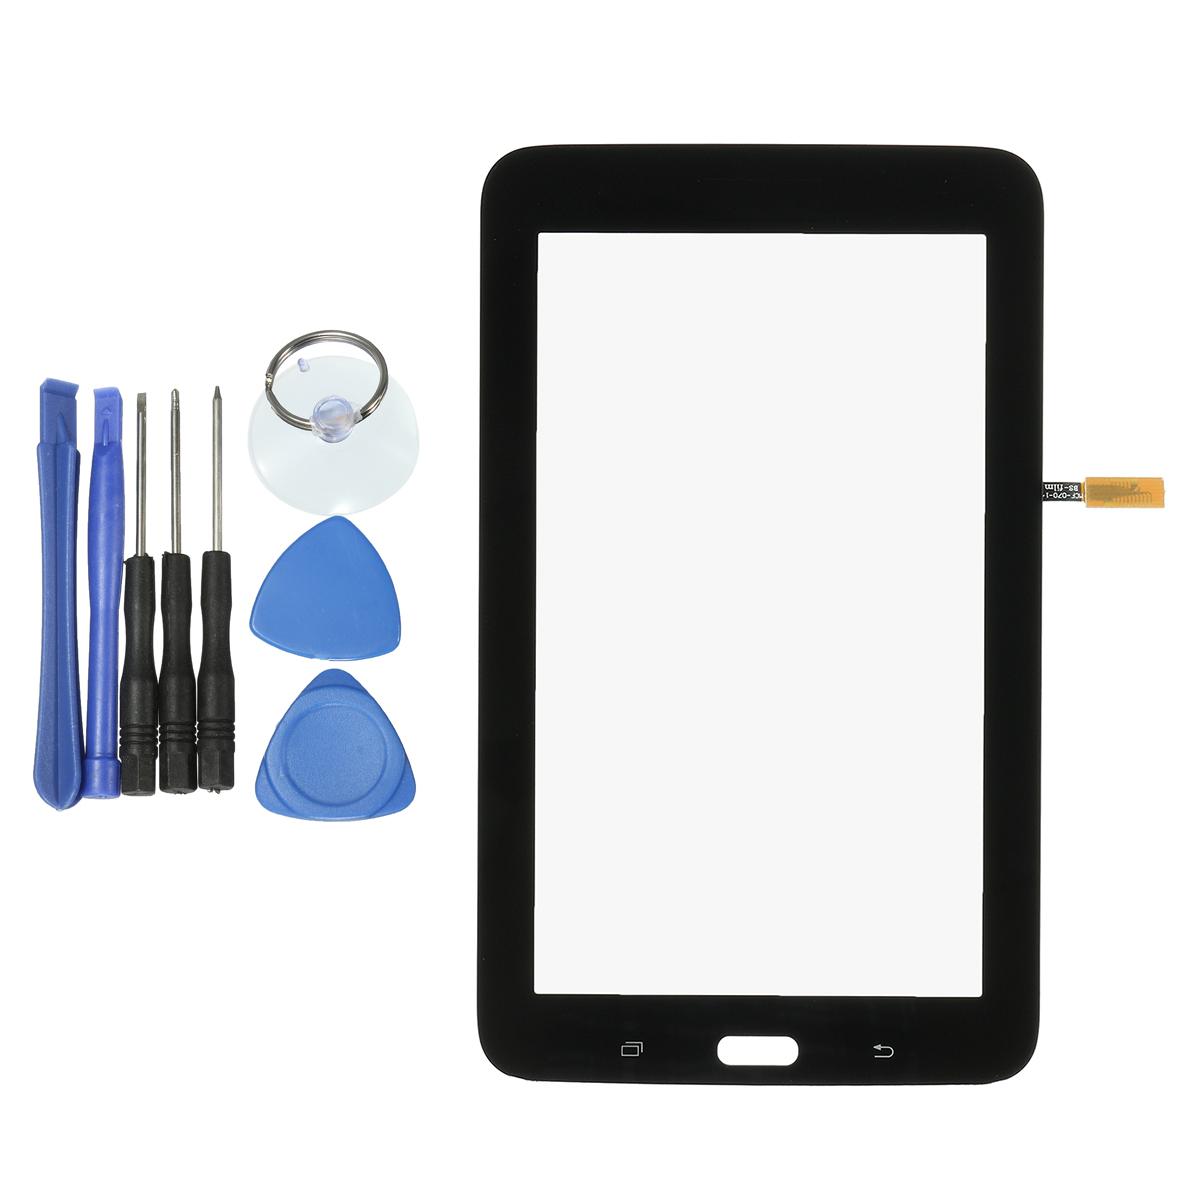 Замена сенсорного экрана LCD Ремонт панели цифрового планшета Инструмент Для Samsung Galaxy Tab 3 Lite 7.0 T110 WiFi